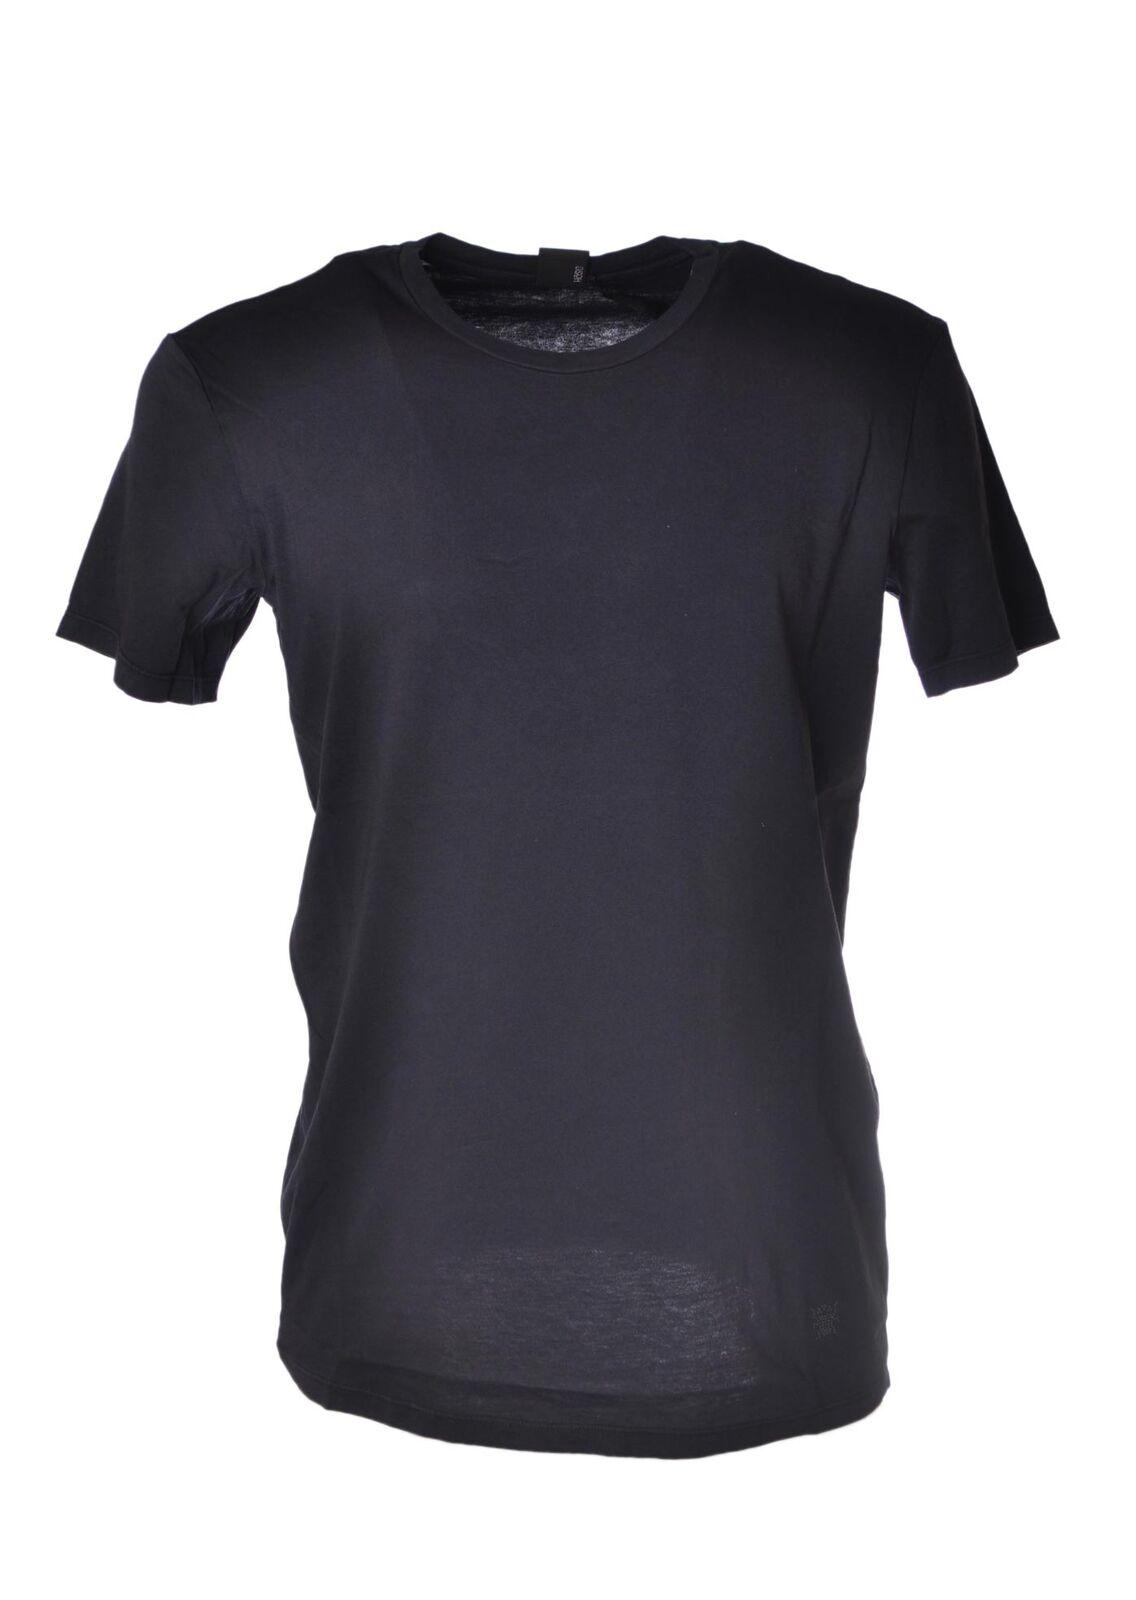 Hosio - Topwear-T-shirts - Man - bluee - 4328506C194921